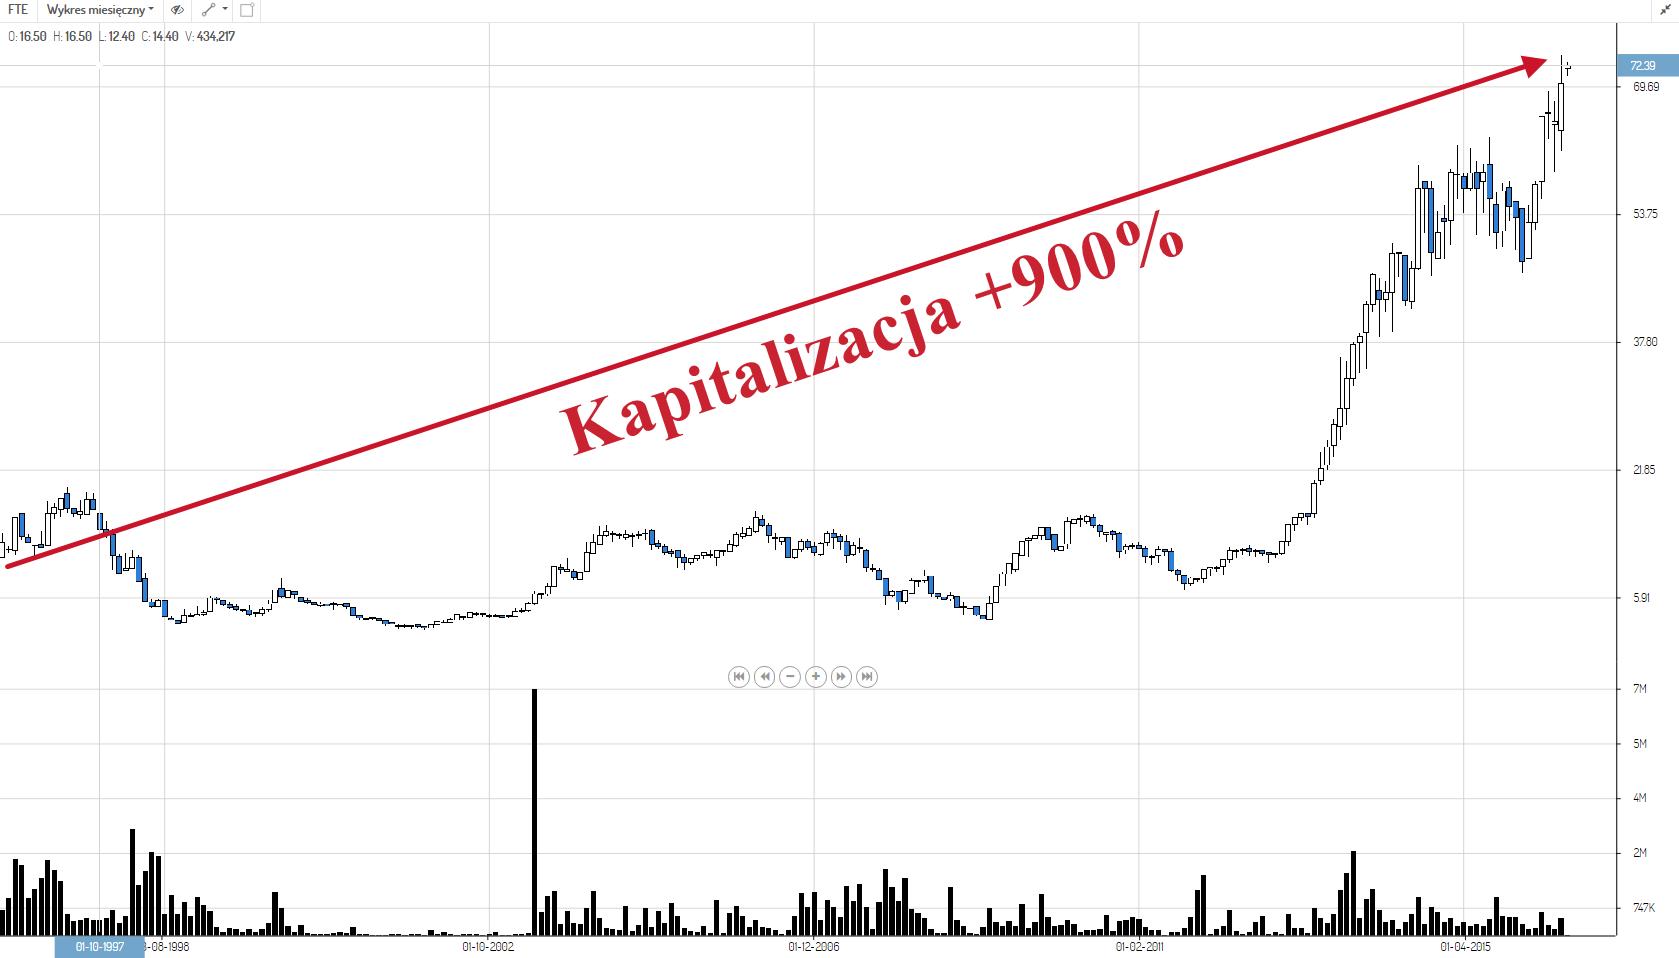 Forte_kapitalizacja